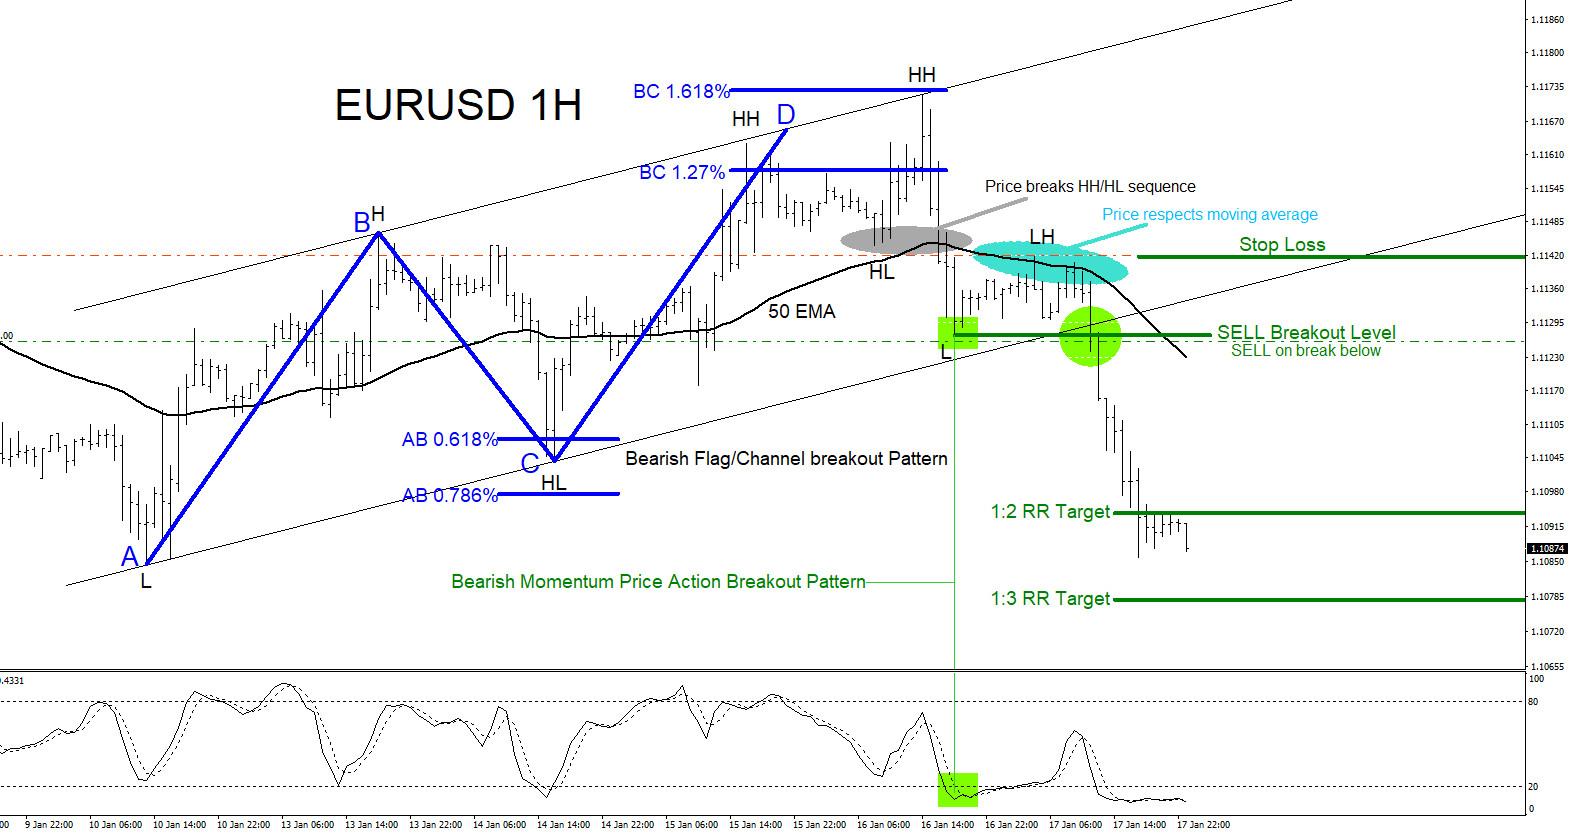 EURUSD : Selling the Breakout Lower